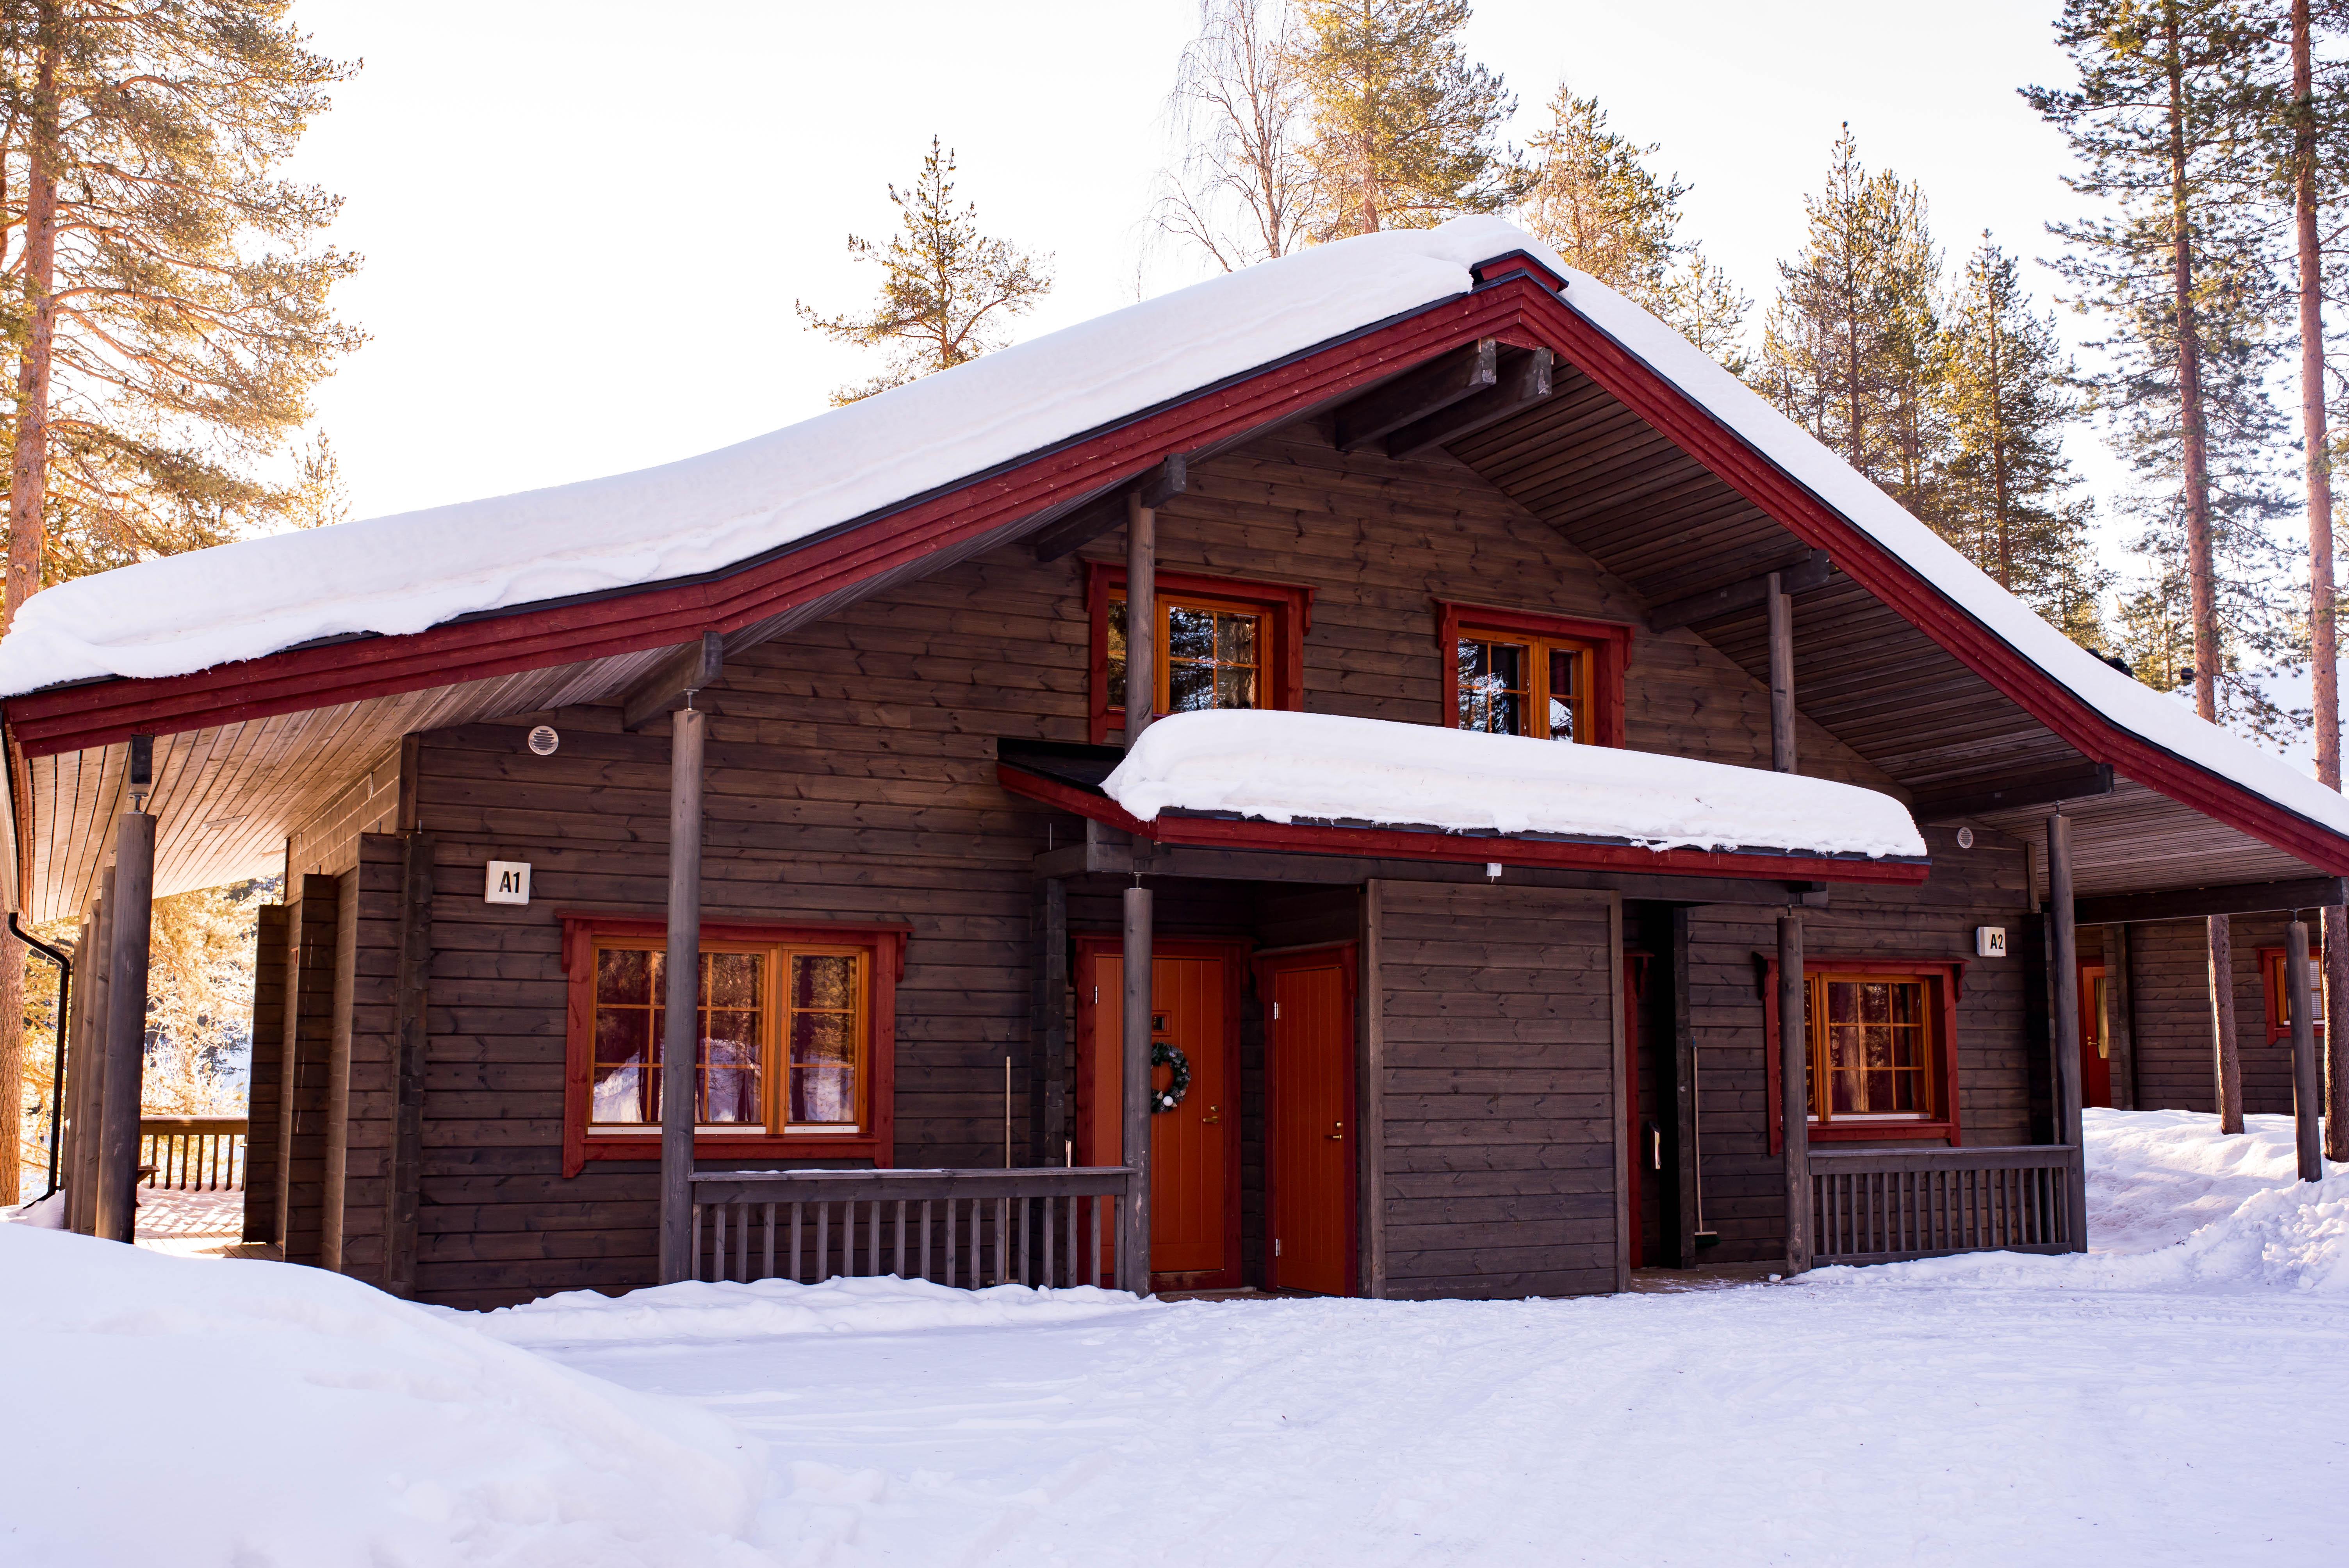 Lapland Hotel Bear's Lodge Finland